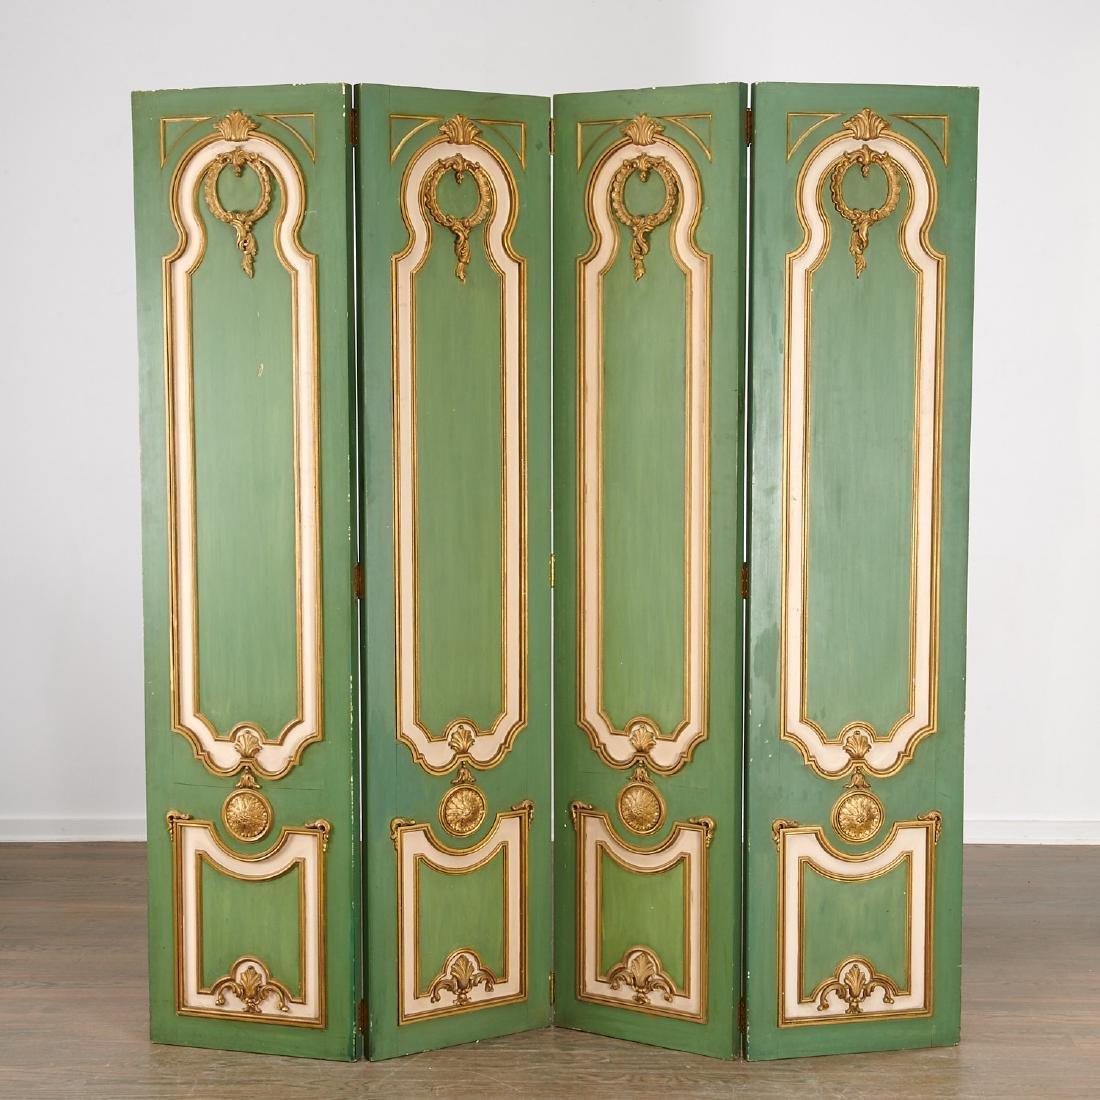 Signed Maison Jansen Louis XVI four-panel screen